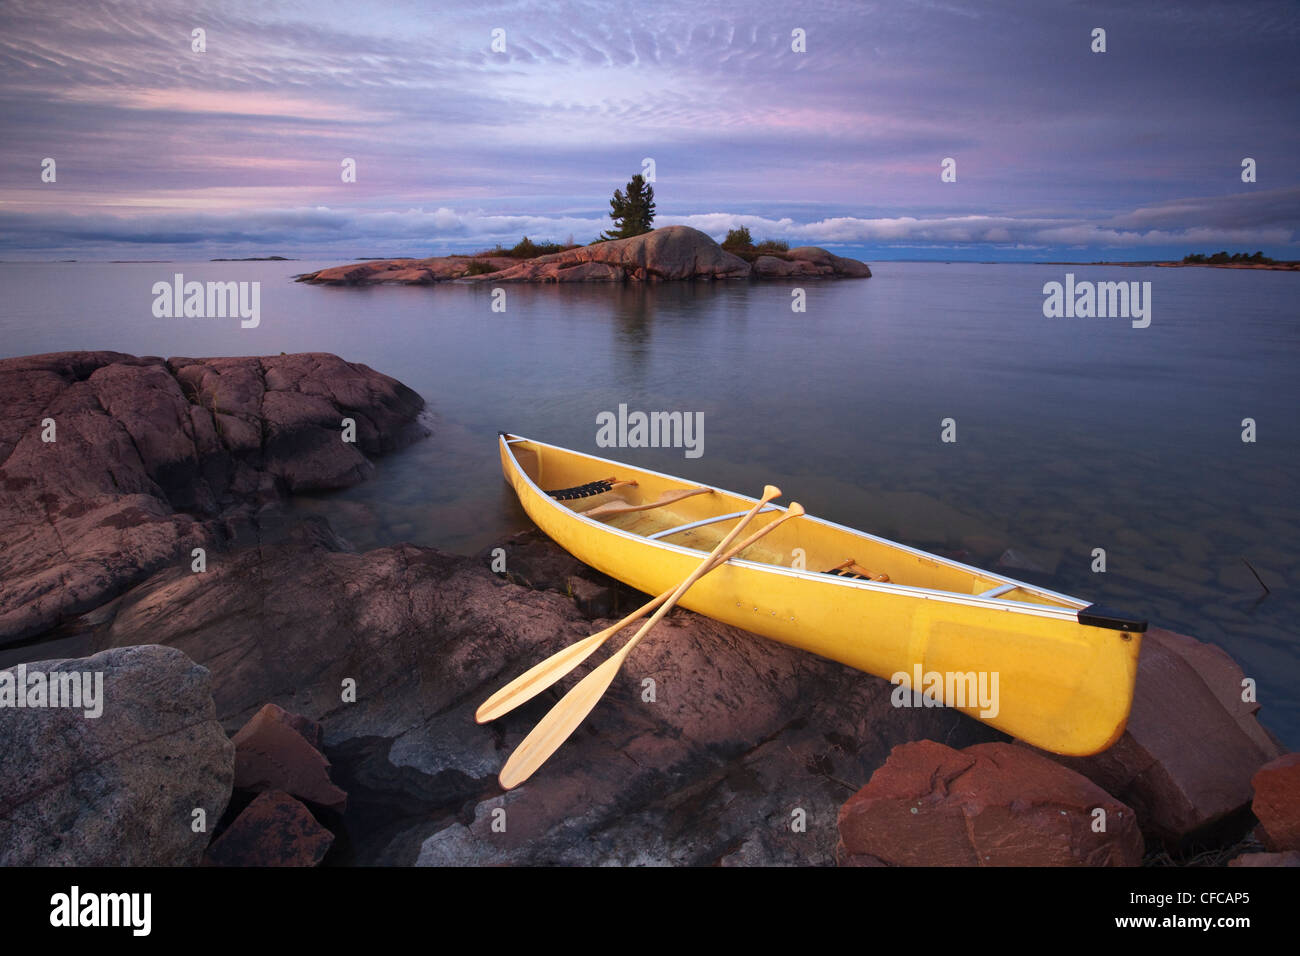 Canoe by granite islands of Georgian Bay, Killarney Provincial Park, Ontario - Stock Image